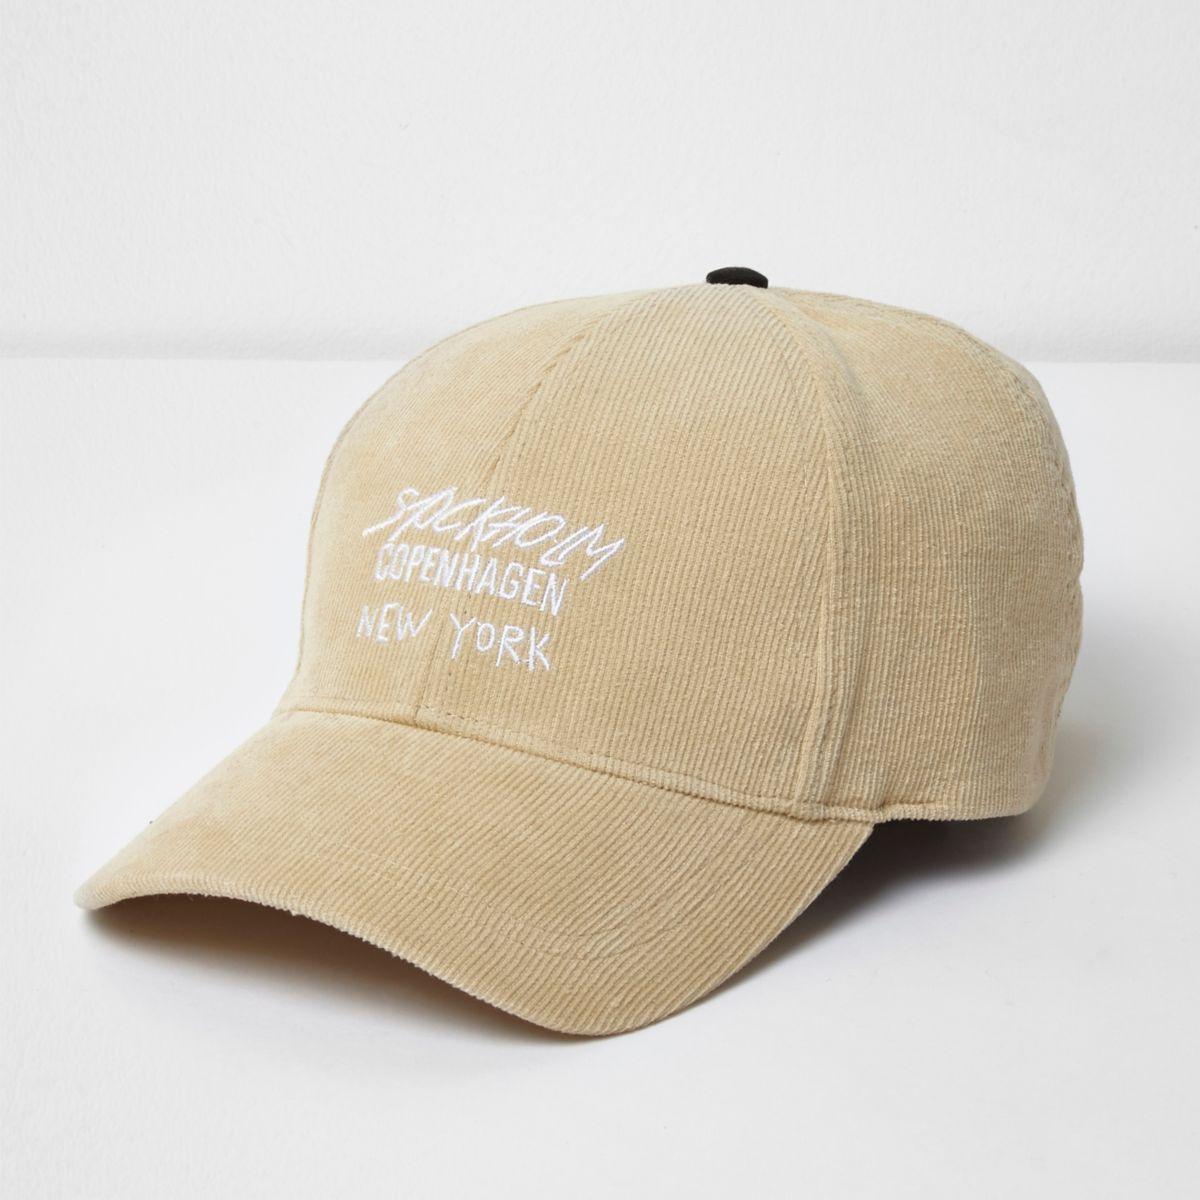 Yellow 'Copenhagen' embroidered cap